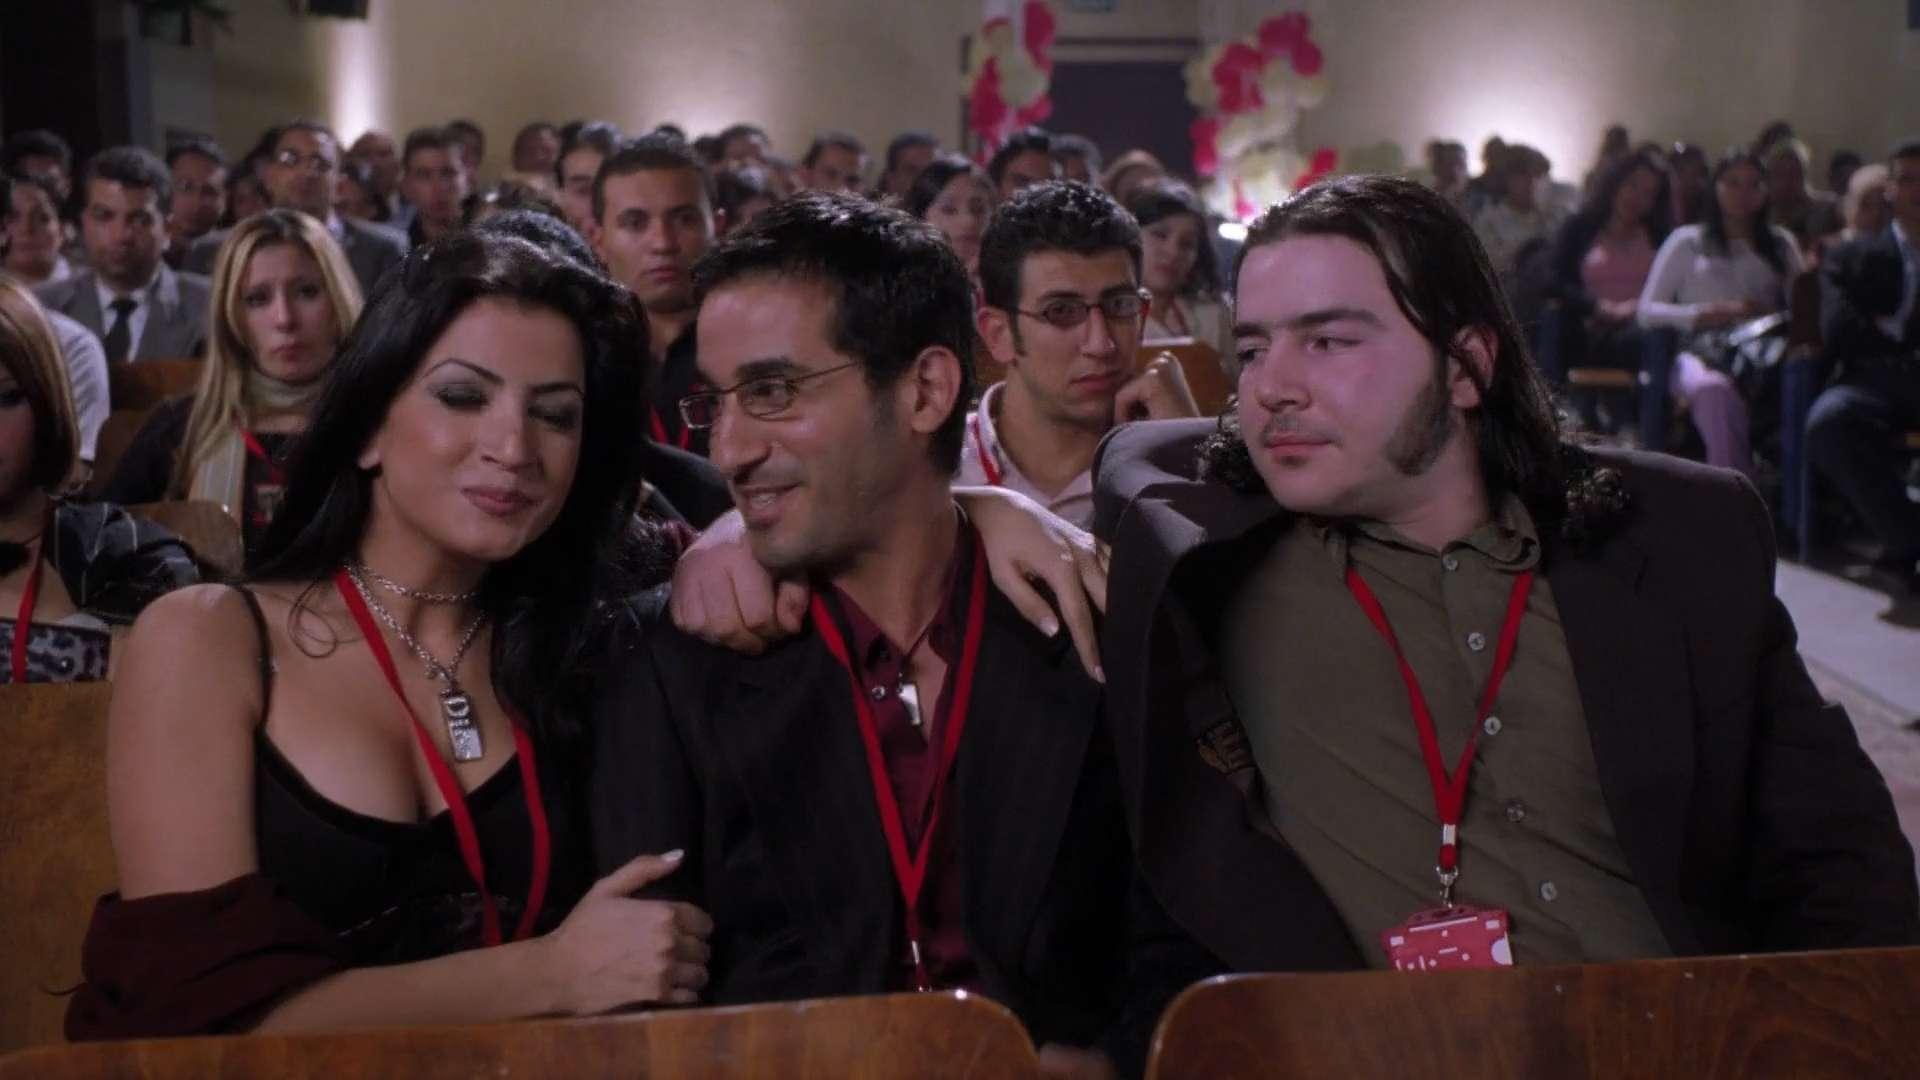 [فيلم][تورنت][تحميل][ظرف طارق][2006][1080p][Web-DL] 6 arabp2p.com